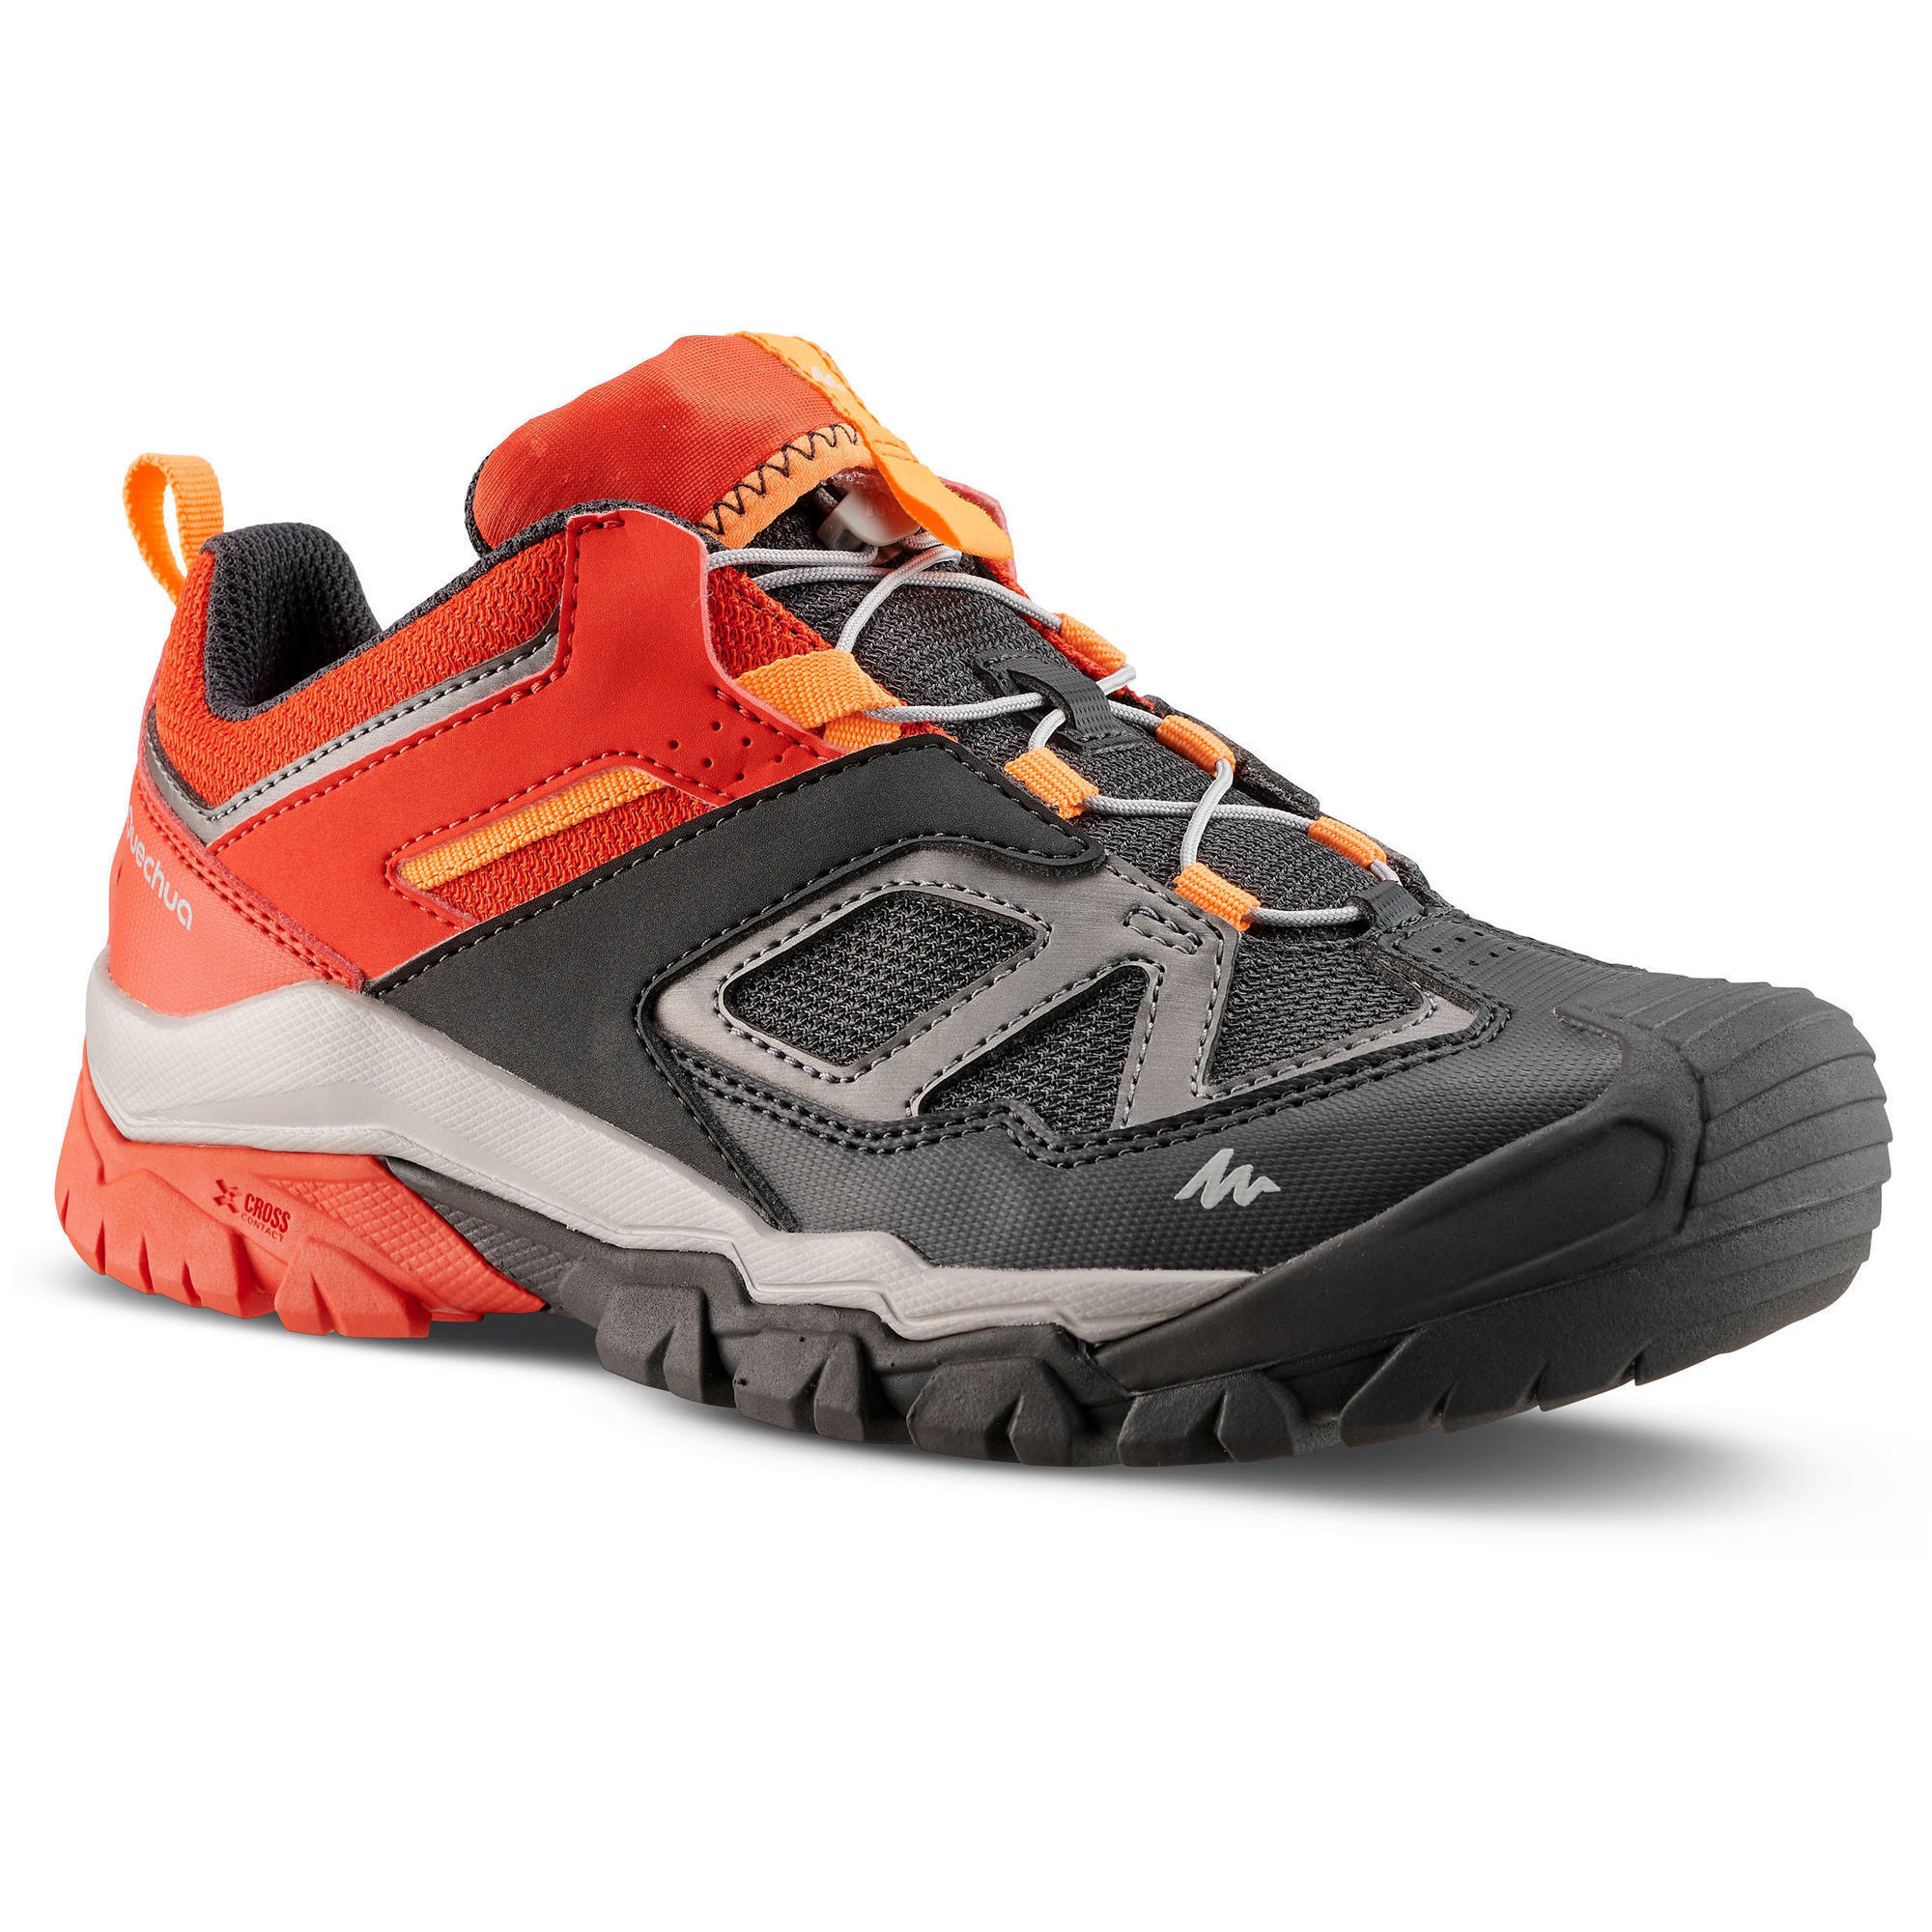 Kids' Walking Shoes | Hiking Boots